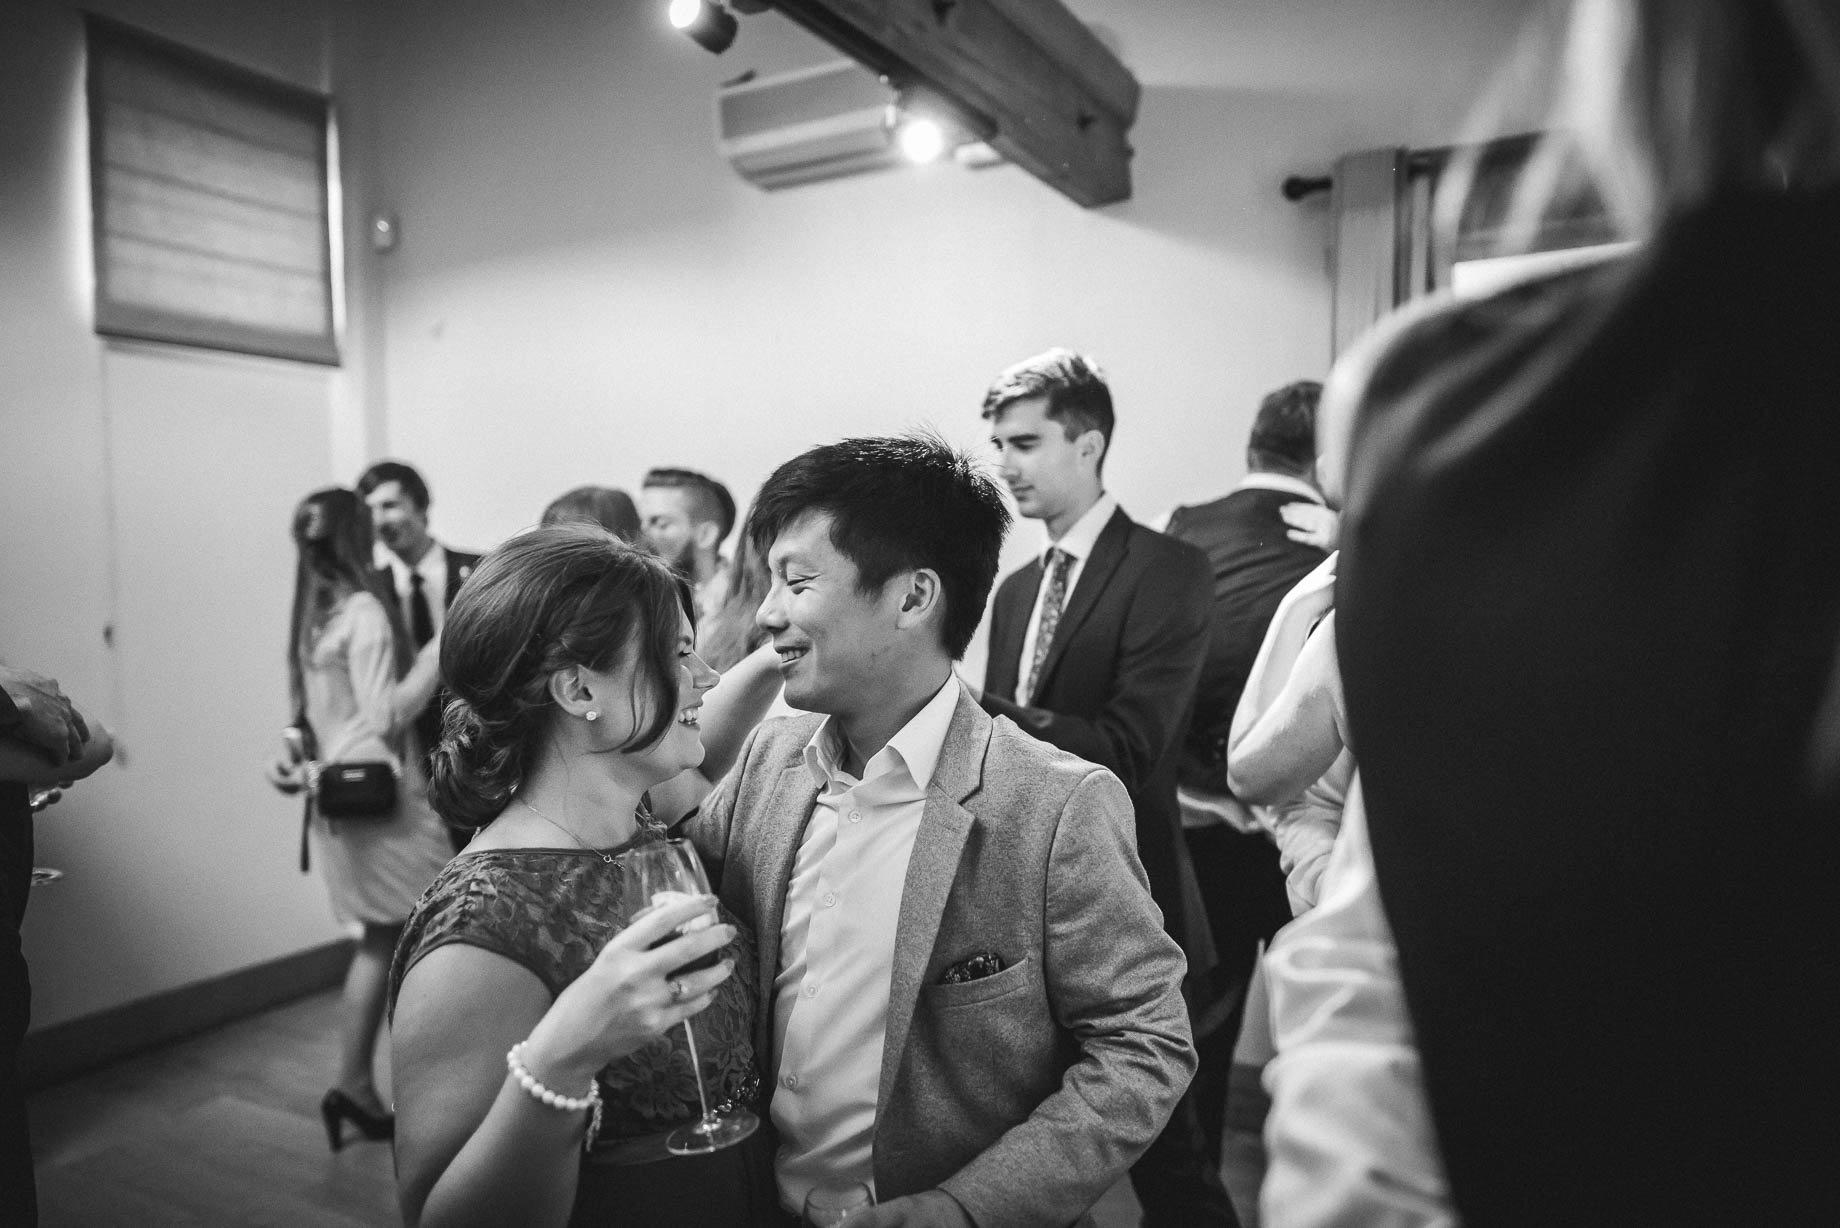 Gaynes Park wedding photography - Guy Collier Photography - Rachel and Jon (168 of 169)